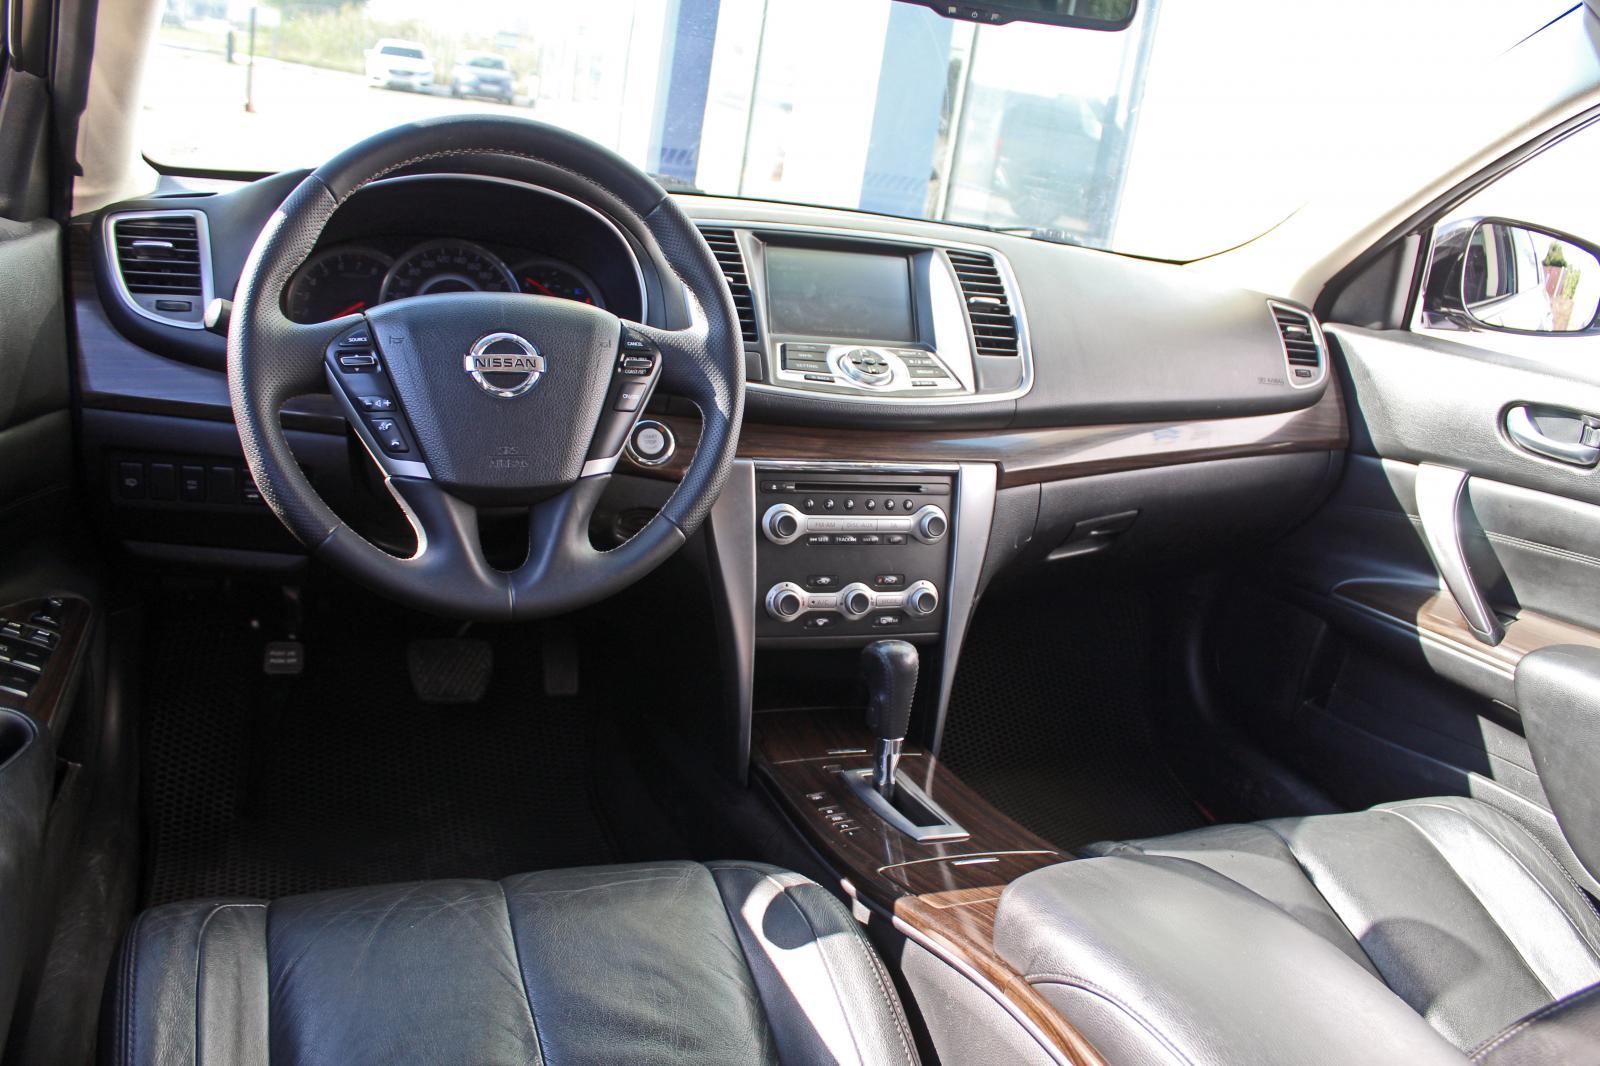 Nissan Teana, II Рестайлинг 2012г.